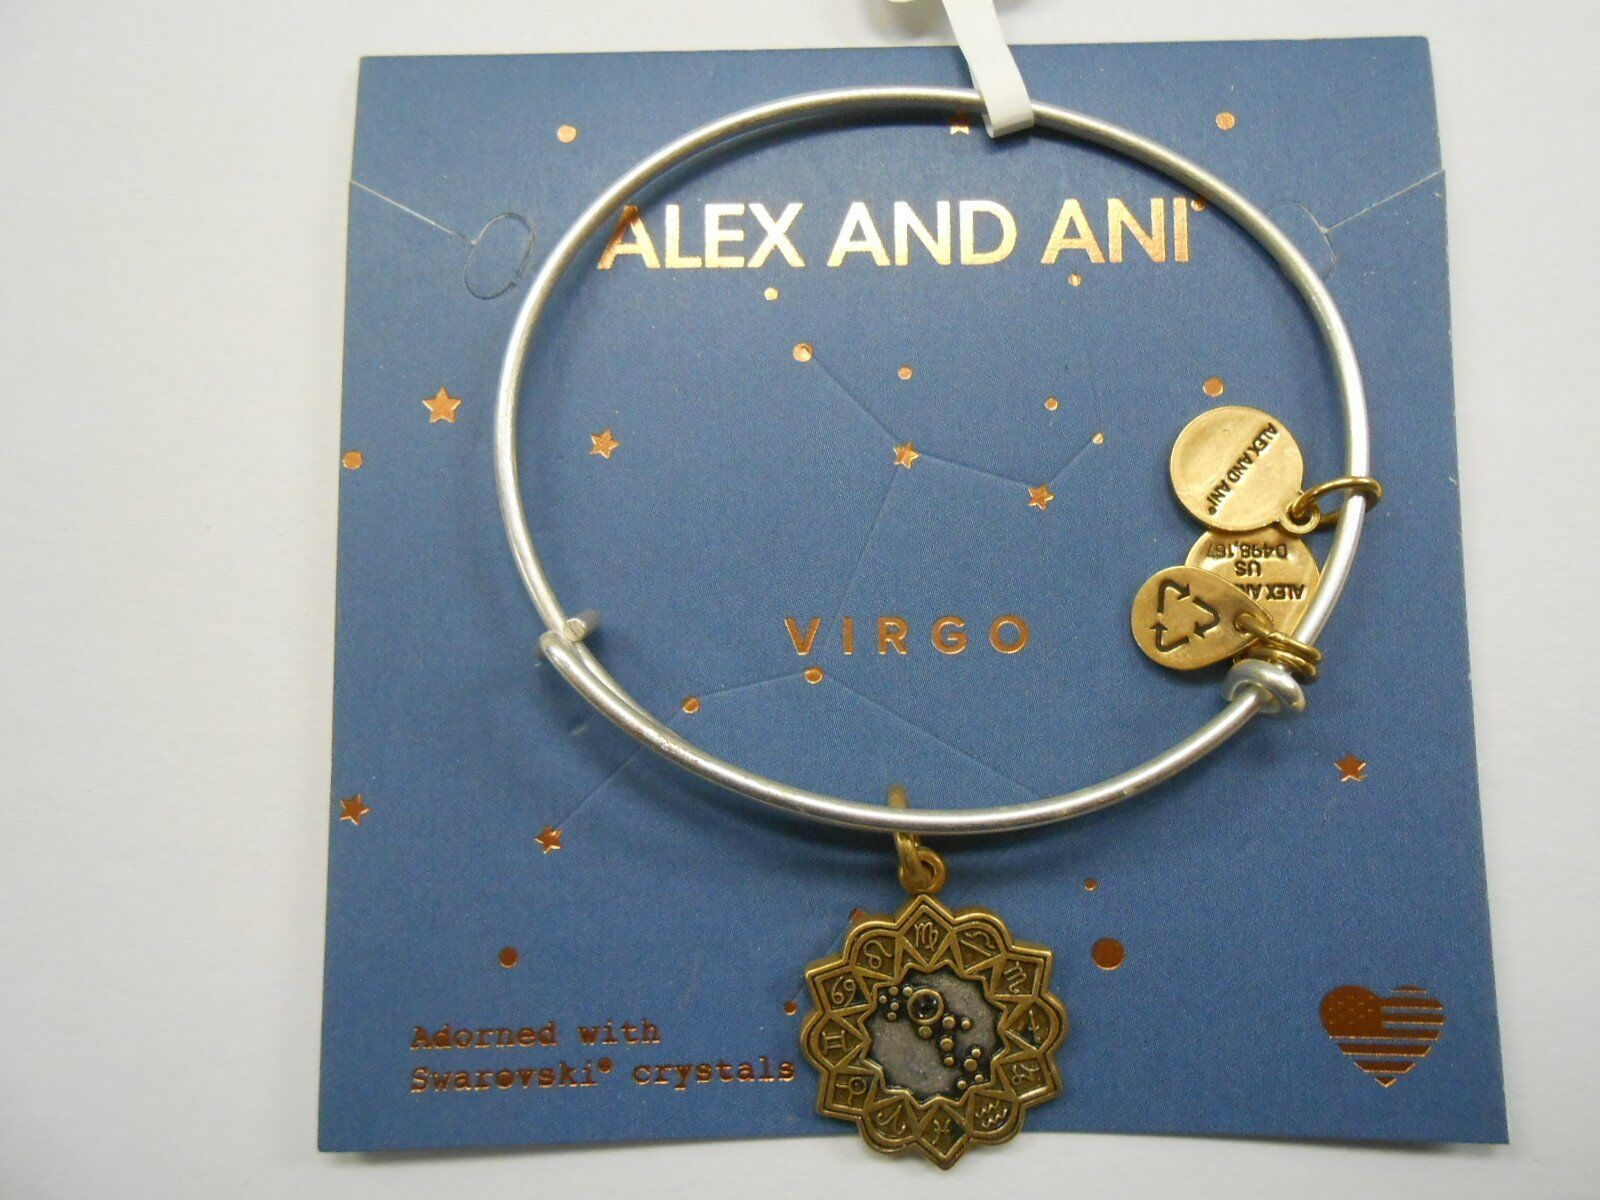 Alex Alex Alex e Ani Vergine Bicolore Bracciale Rigido Nwtbc d29581